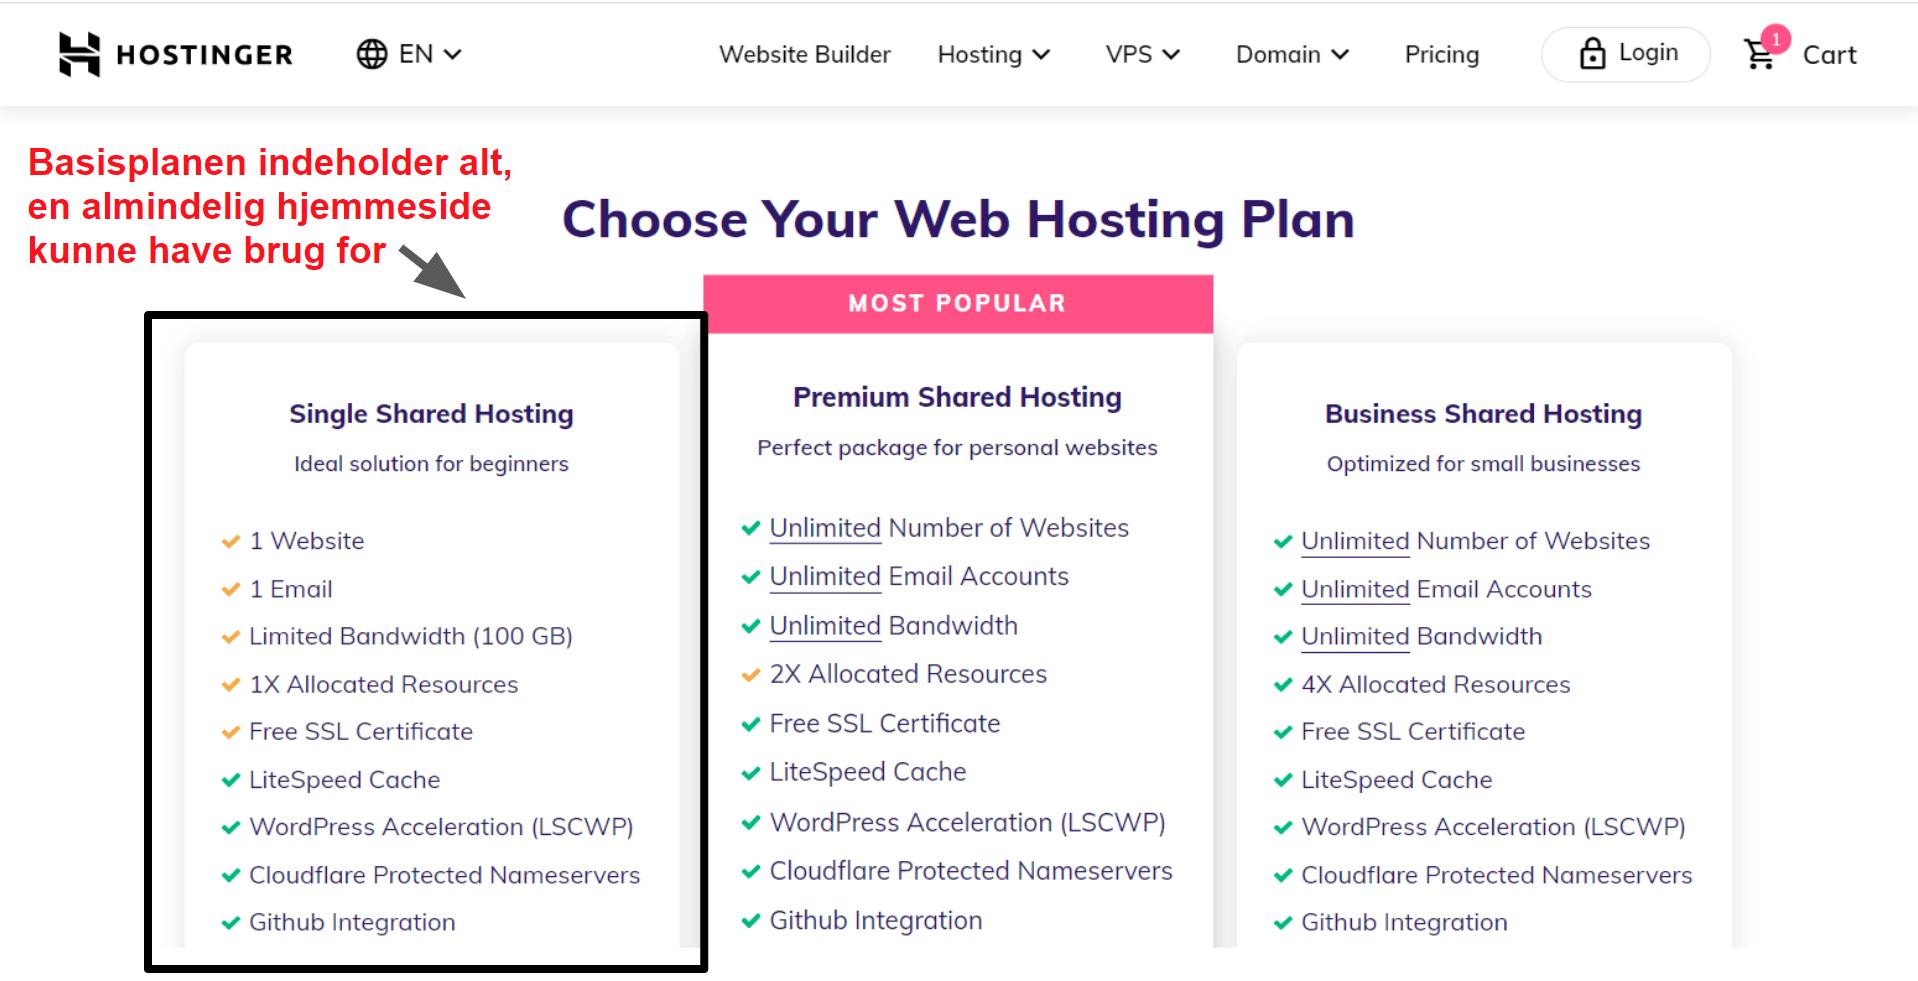 hosting plan features_DA